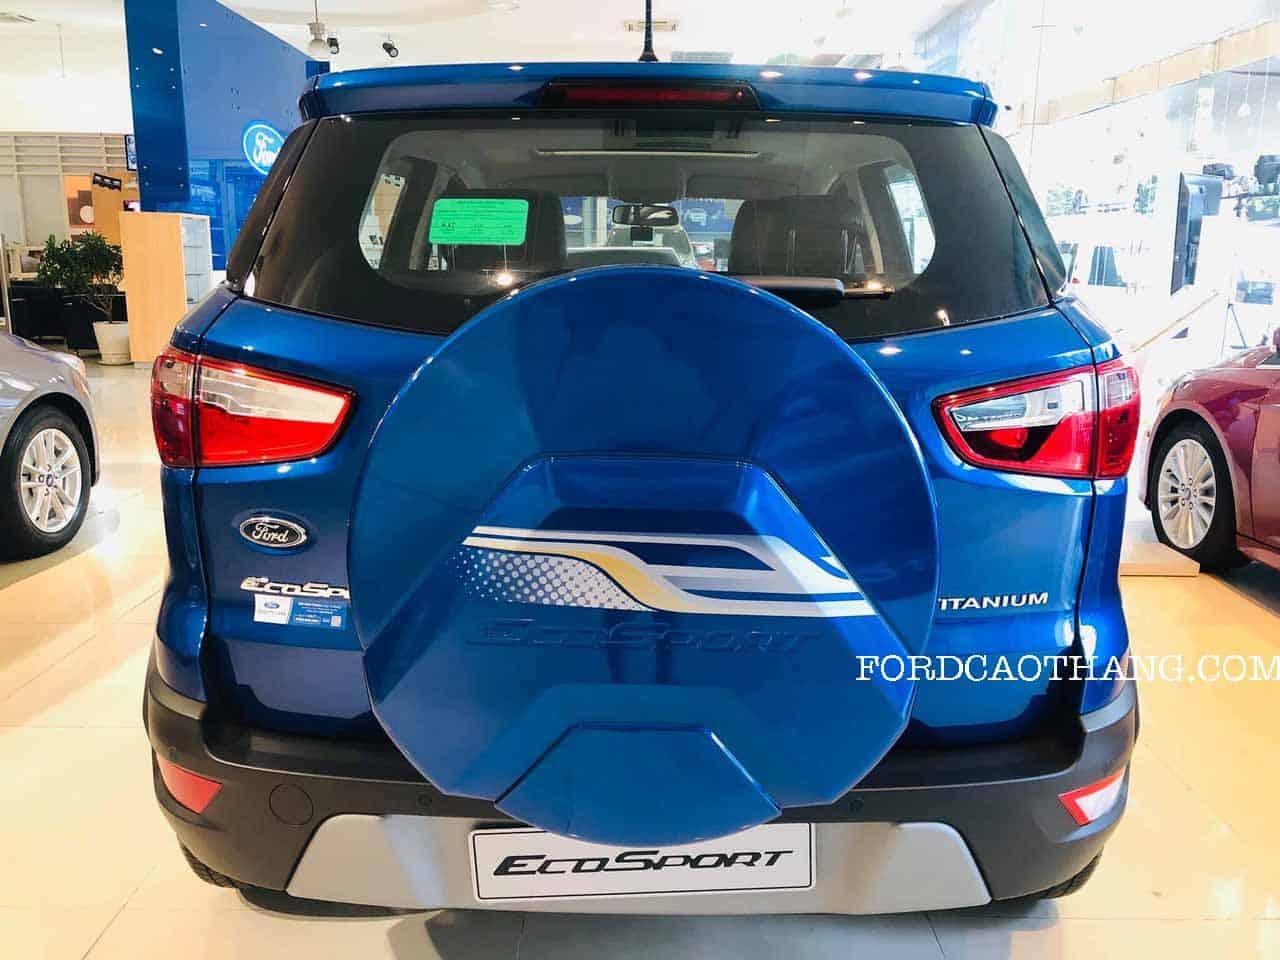 Đuôi xe ford ecopsort titanium 2020